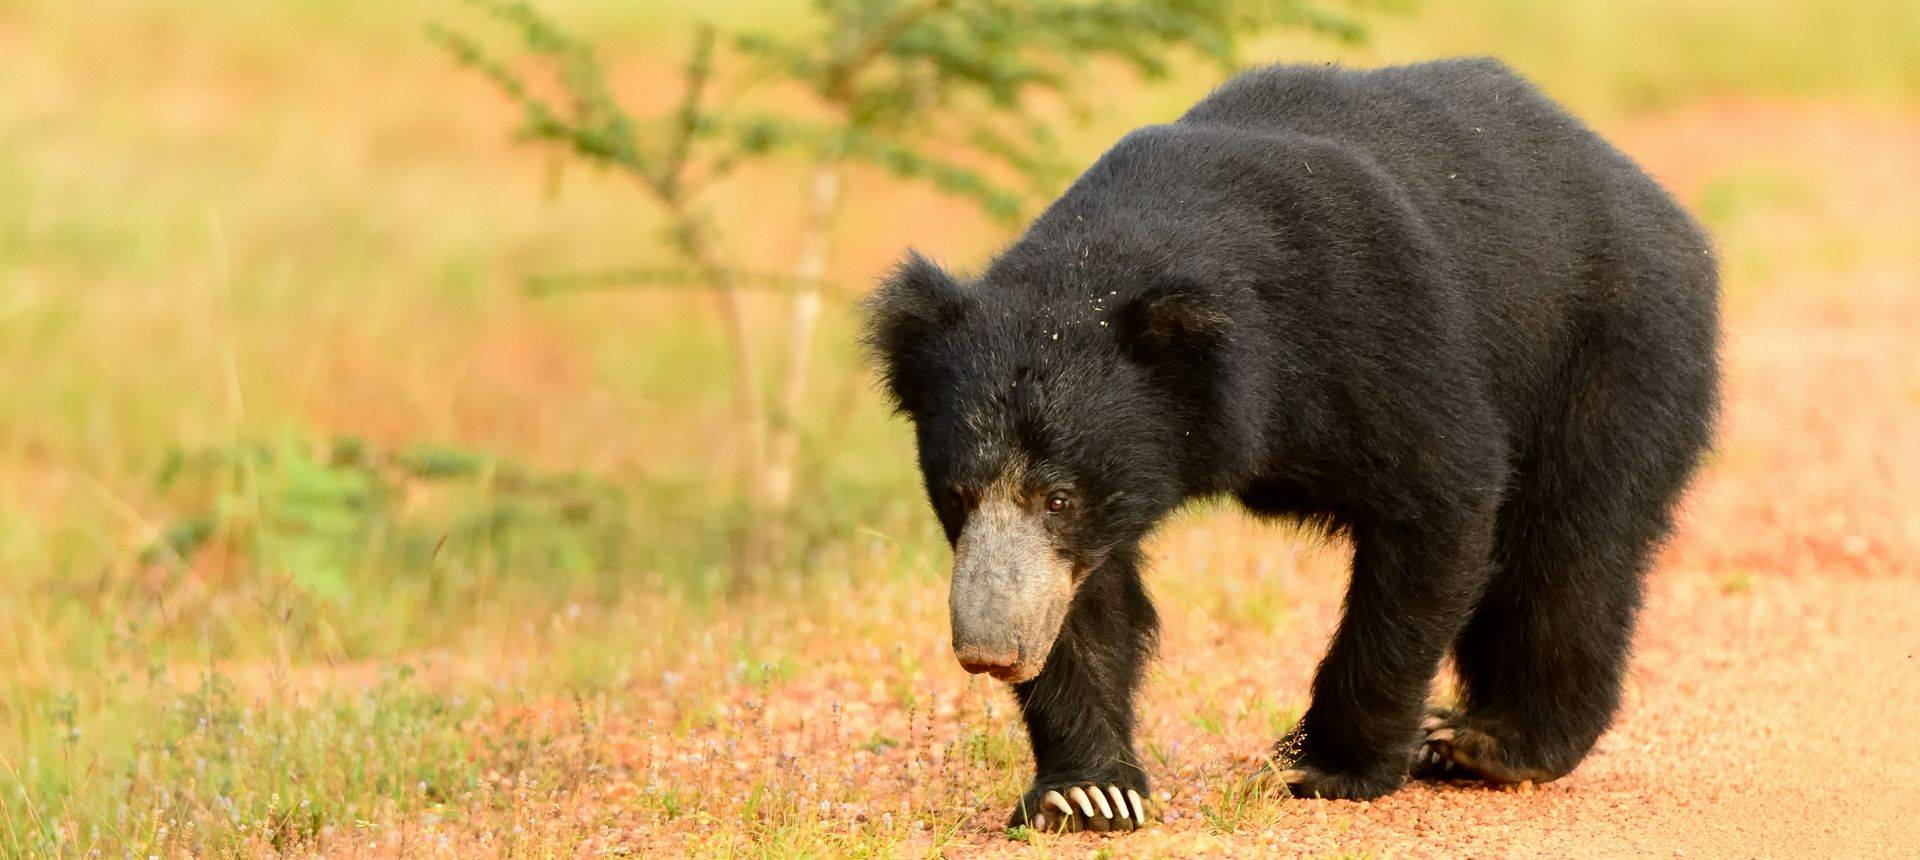 Sloth Bear Shutterstock 410196538